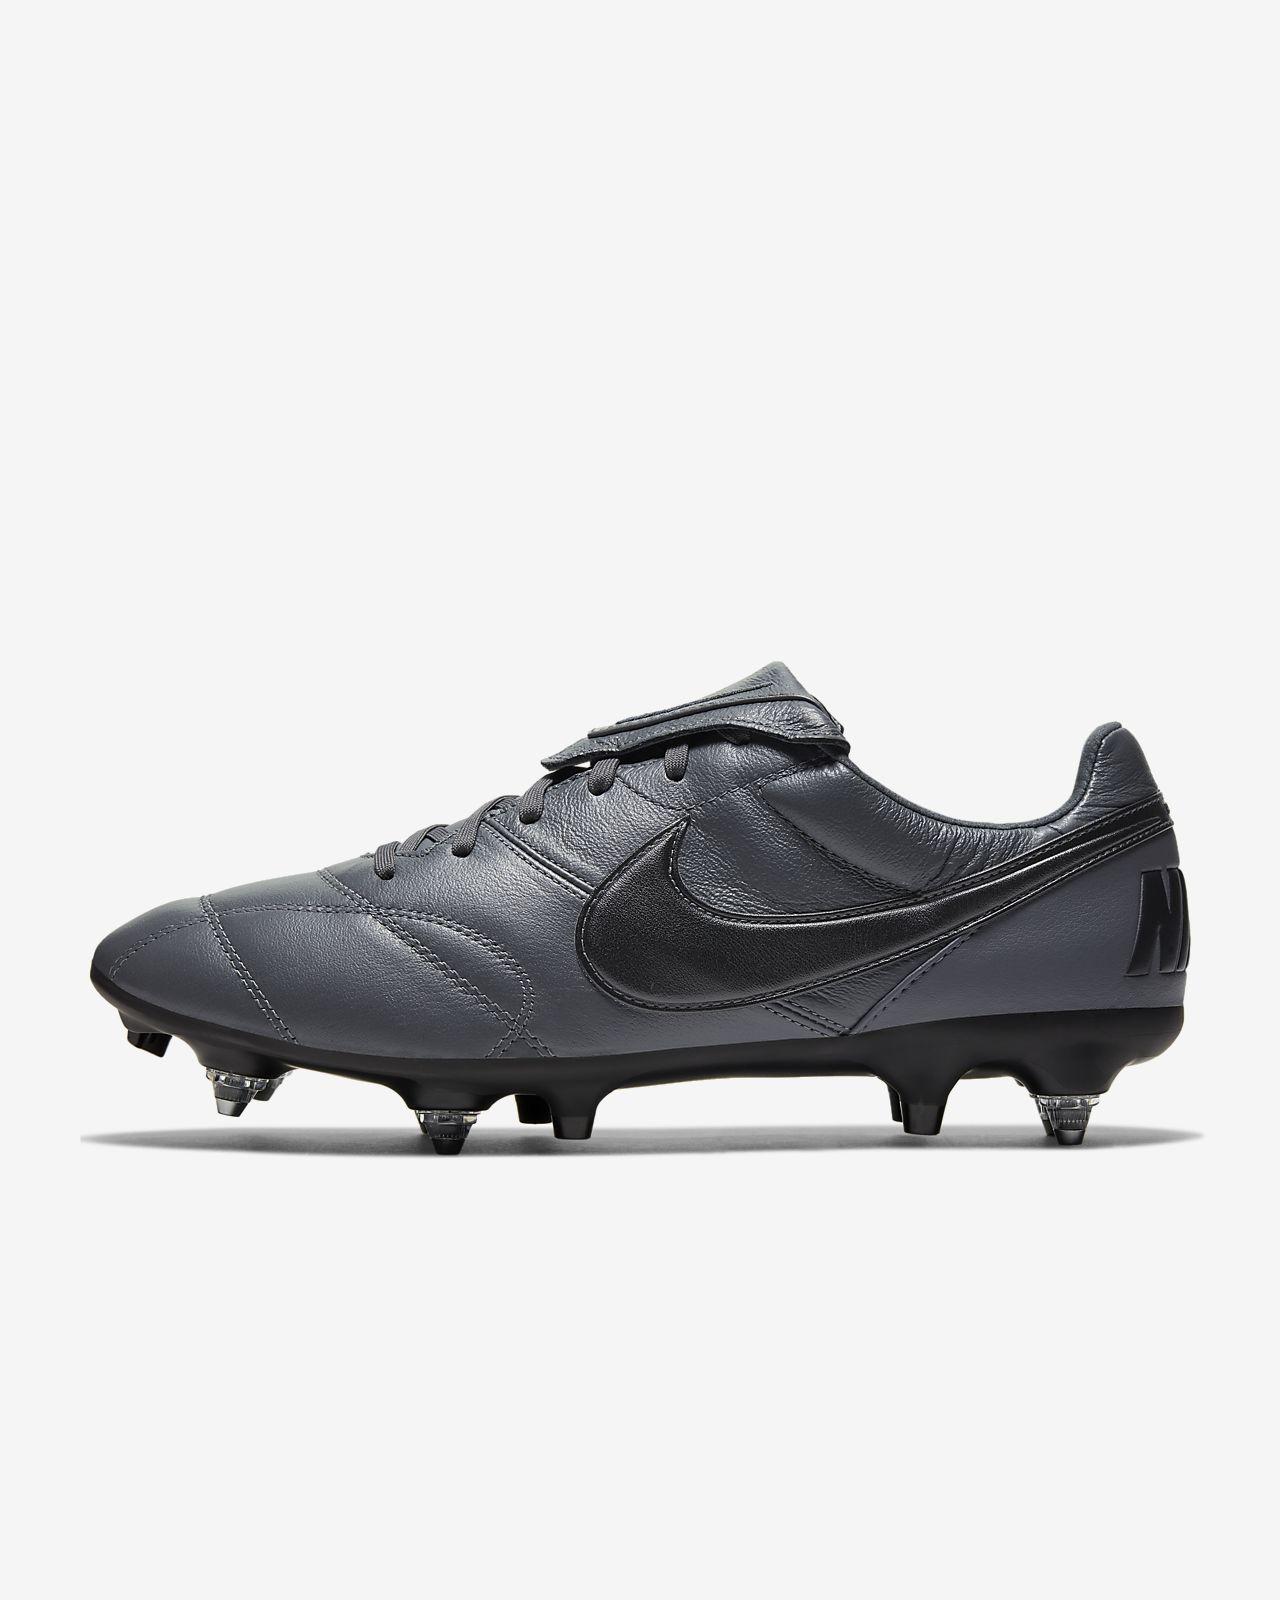 latest discount 100% top quality official supplier Chaussure de football à crampons pour terrain gras Nike Premier II  Anti-Clog Traction SG-PRO